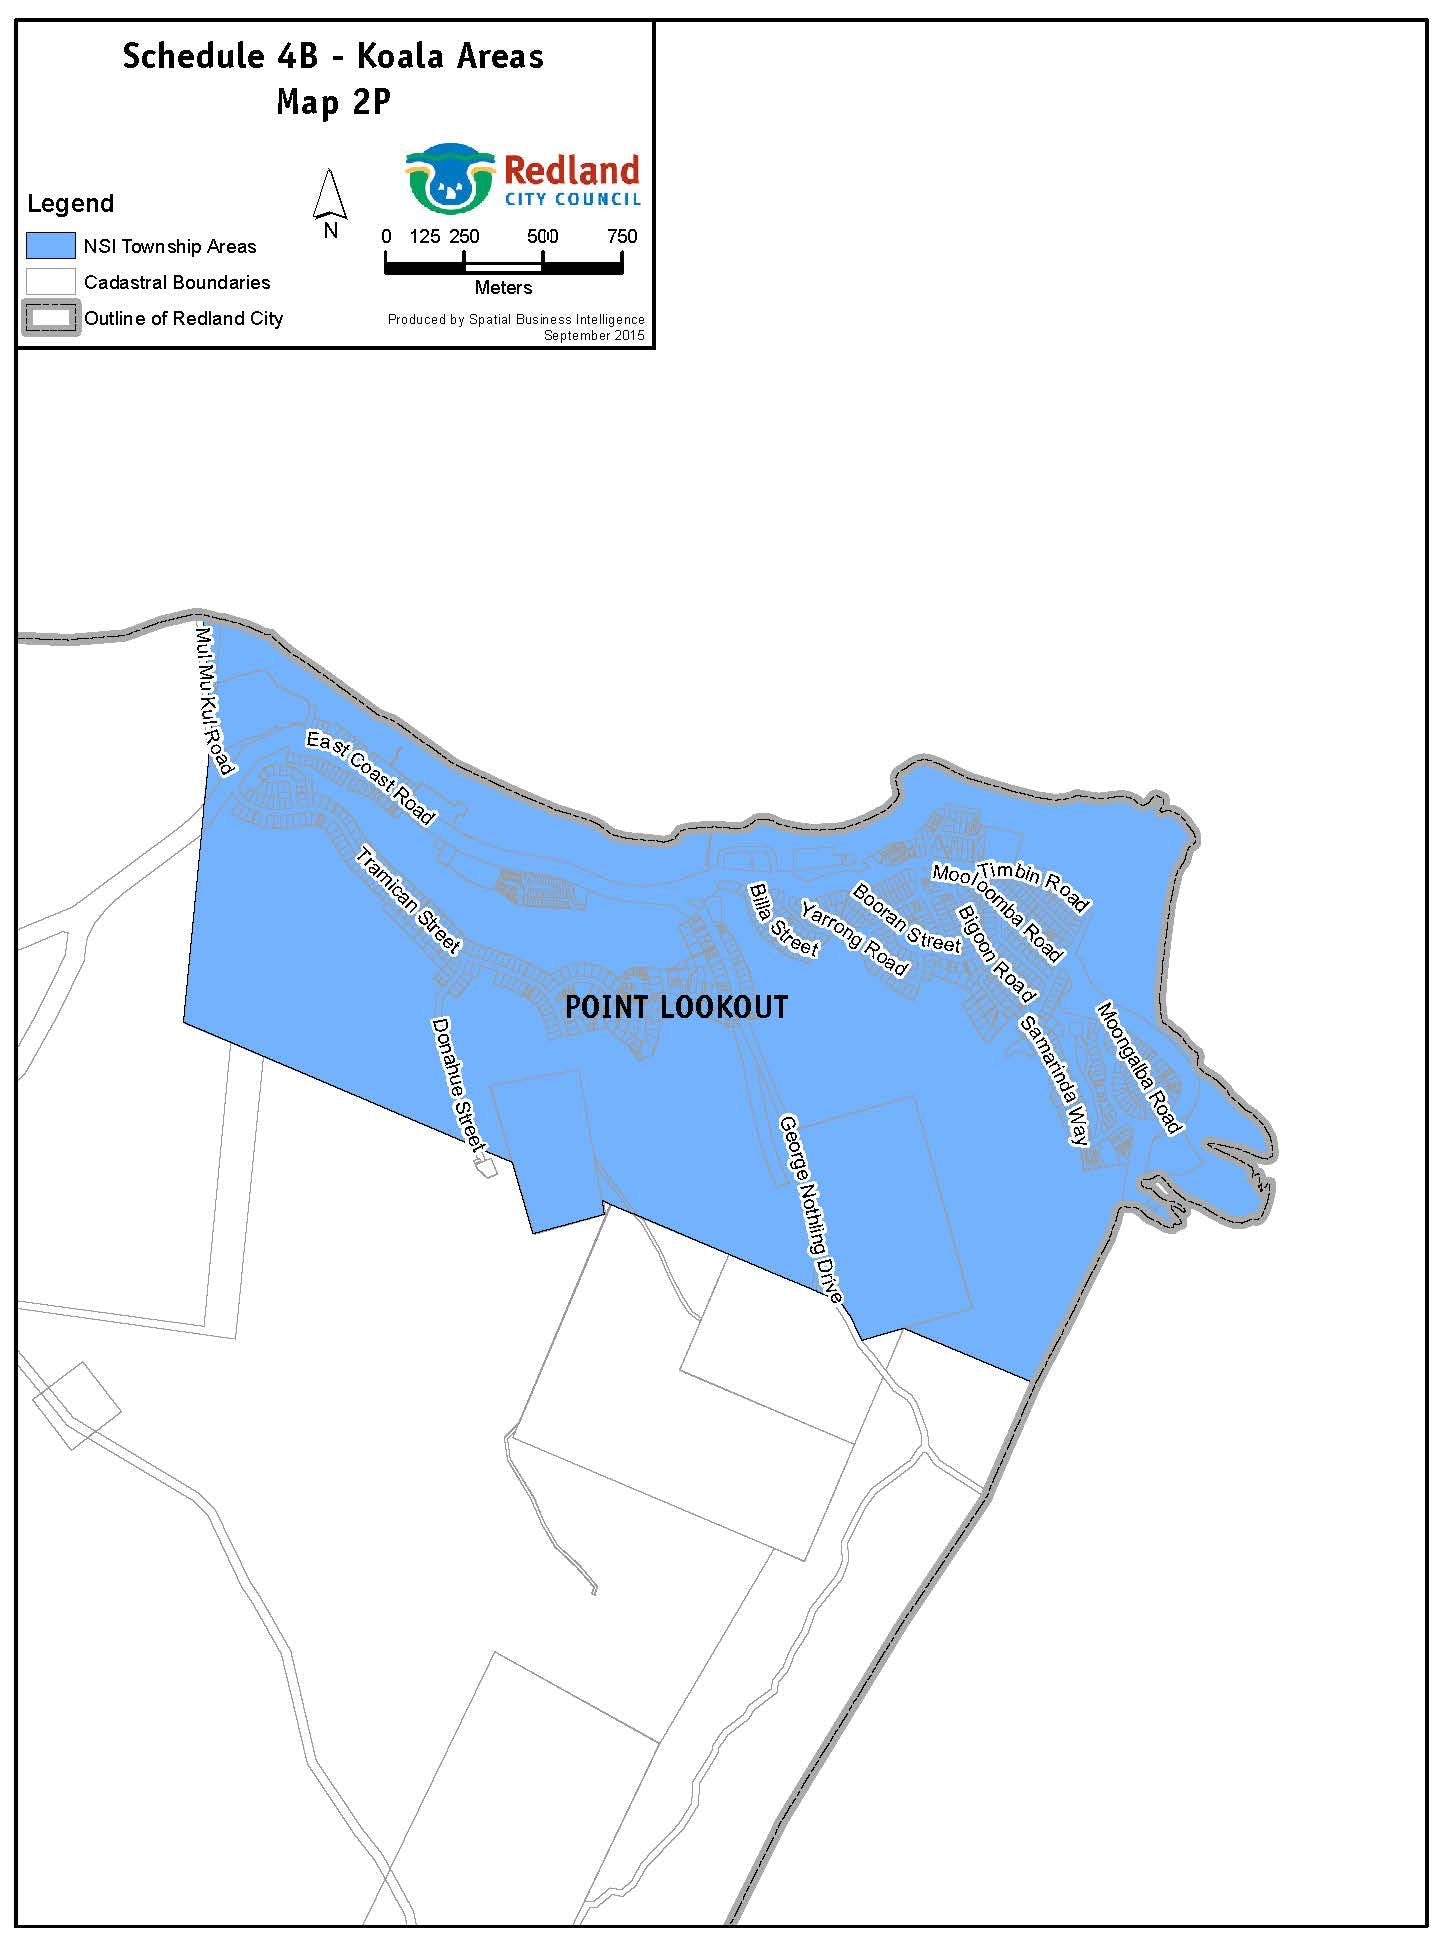 Koala Areas - Map NSI 2P